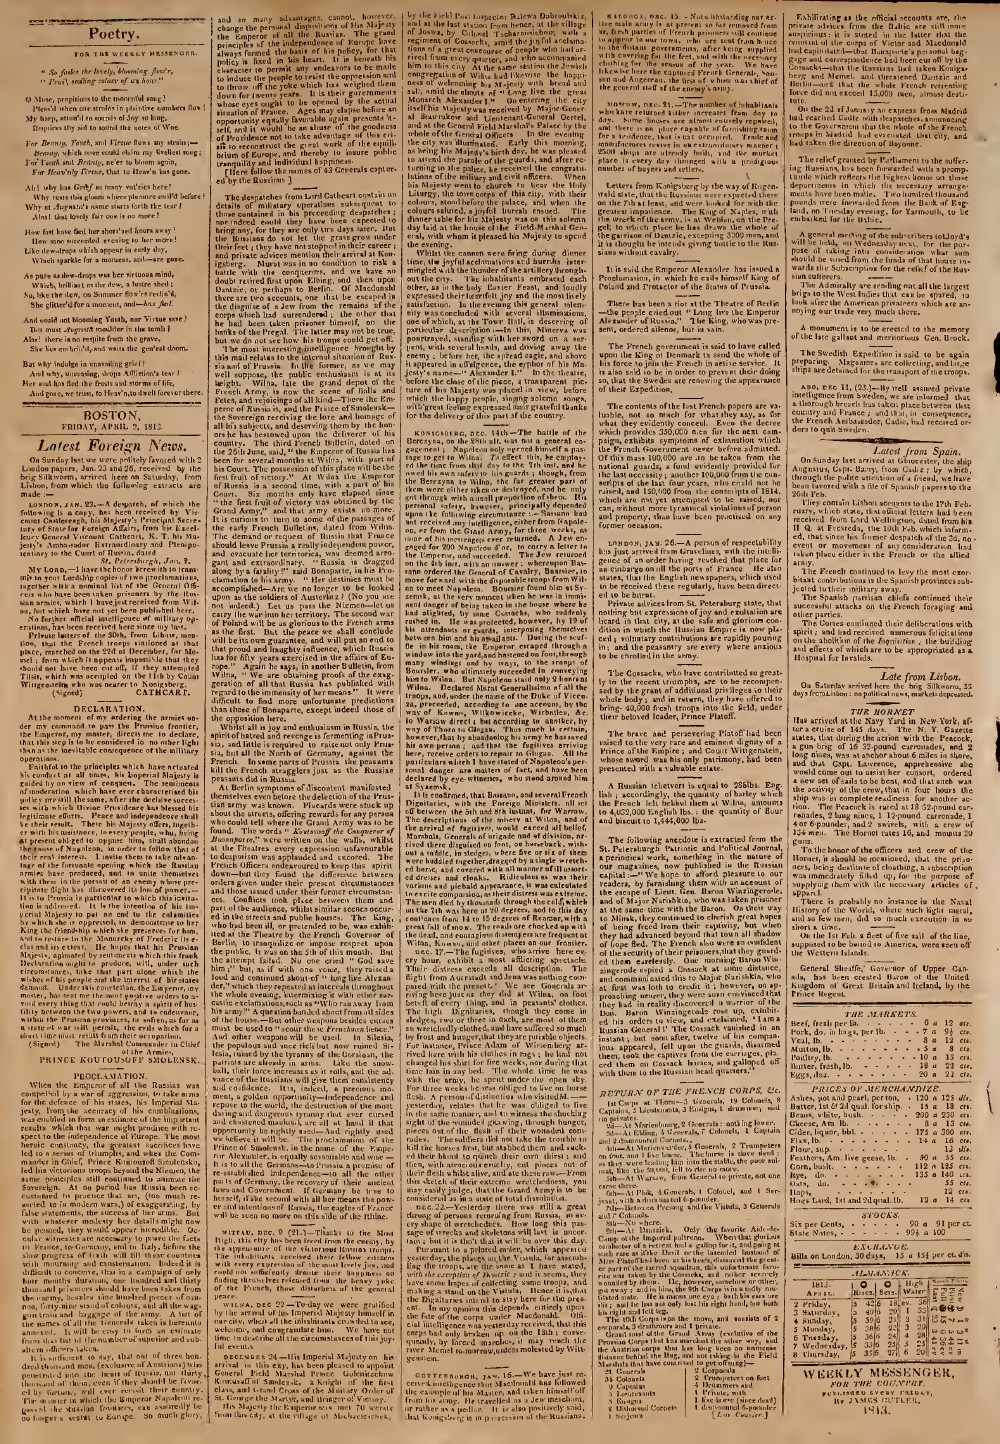 The Weekly Messenger, 2 April 1813 (vol. 2, no. 24)